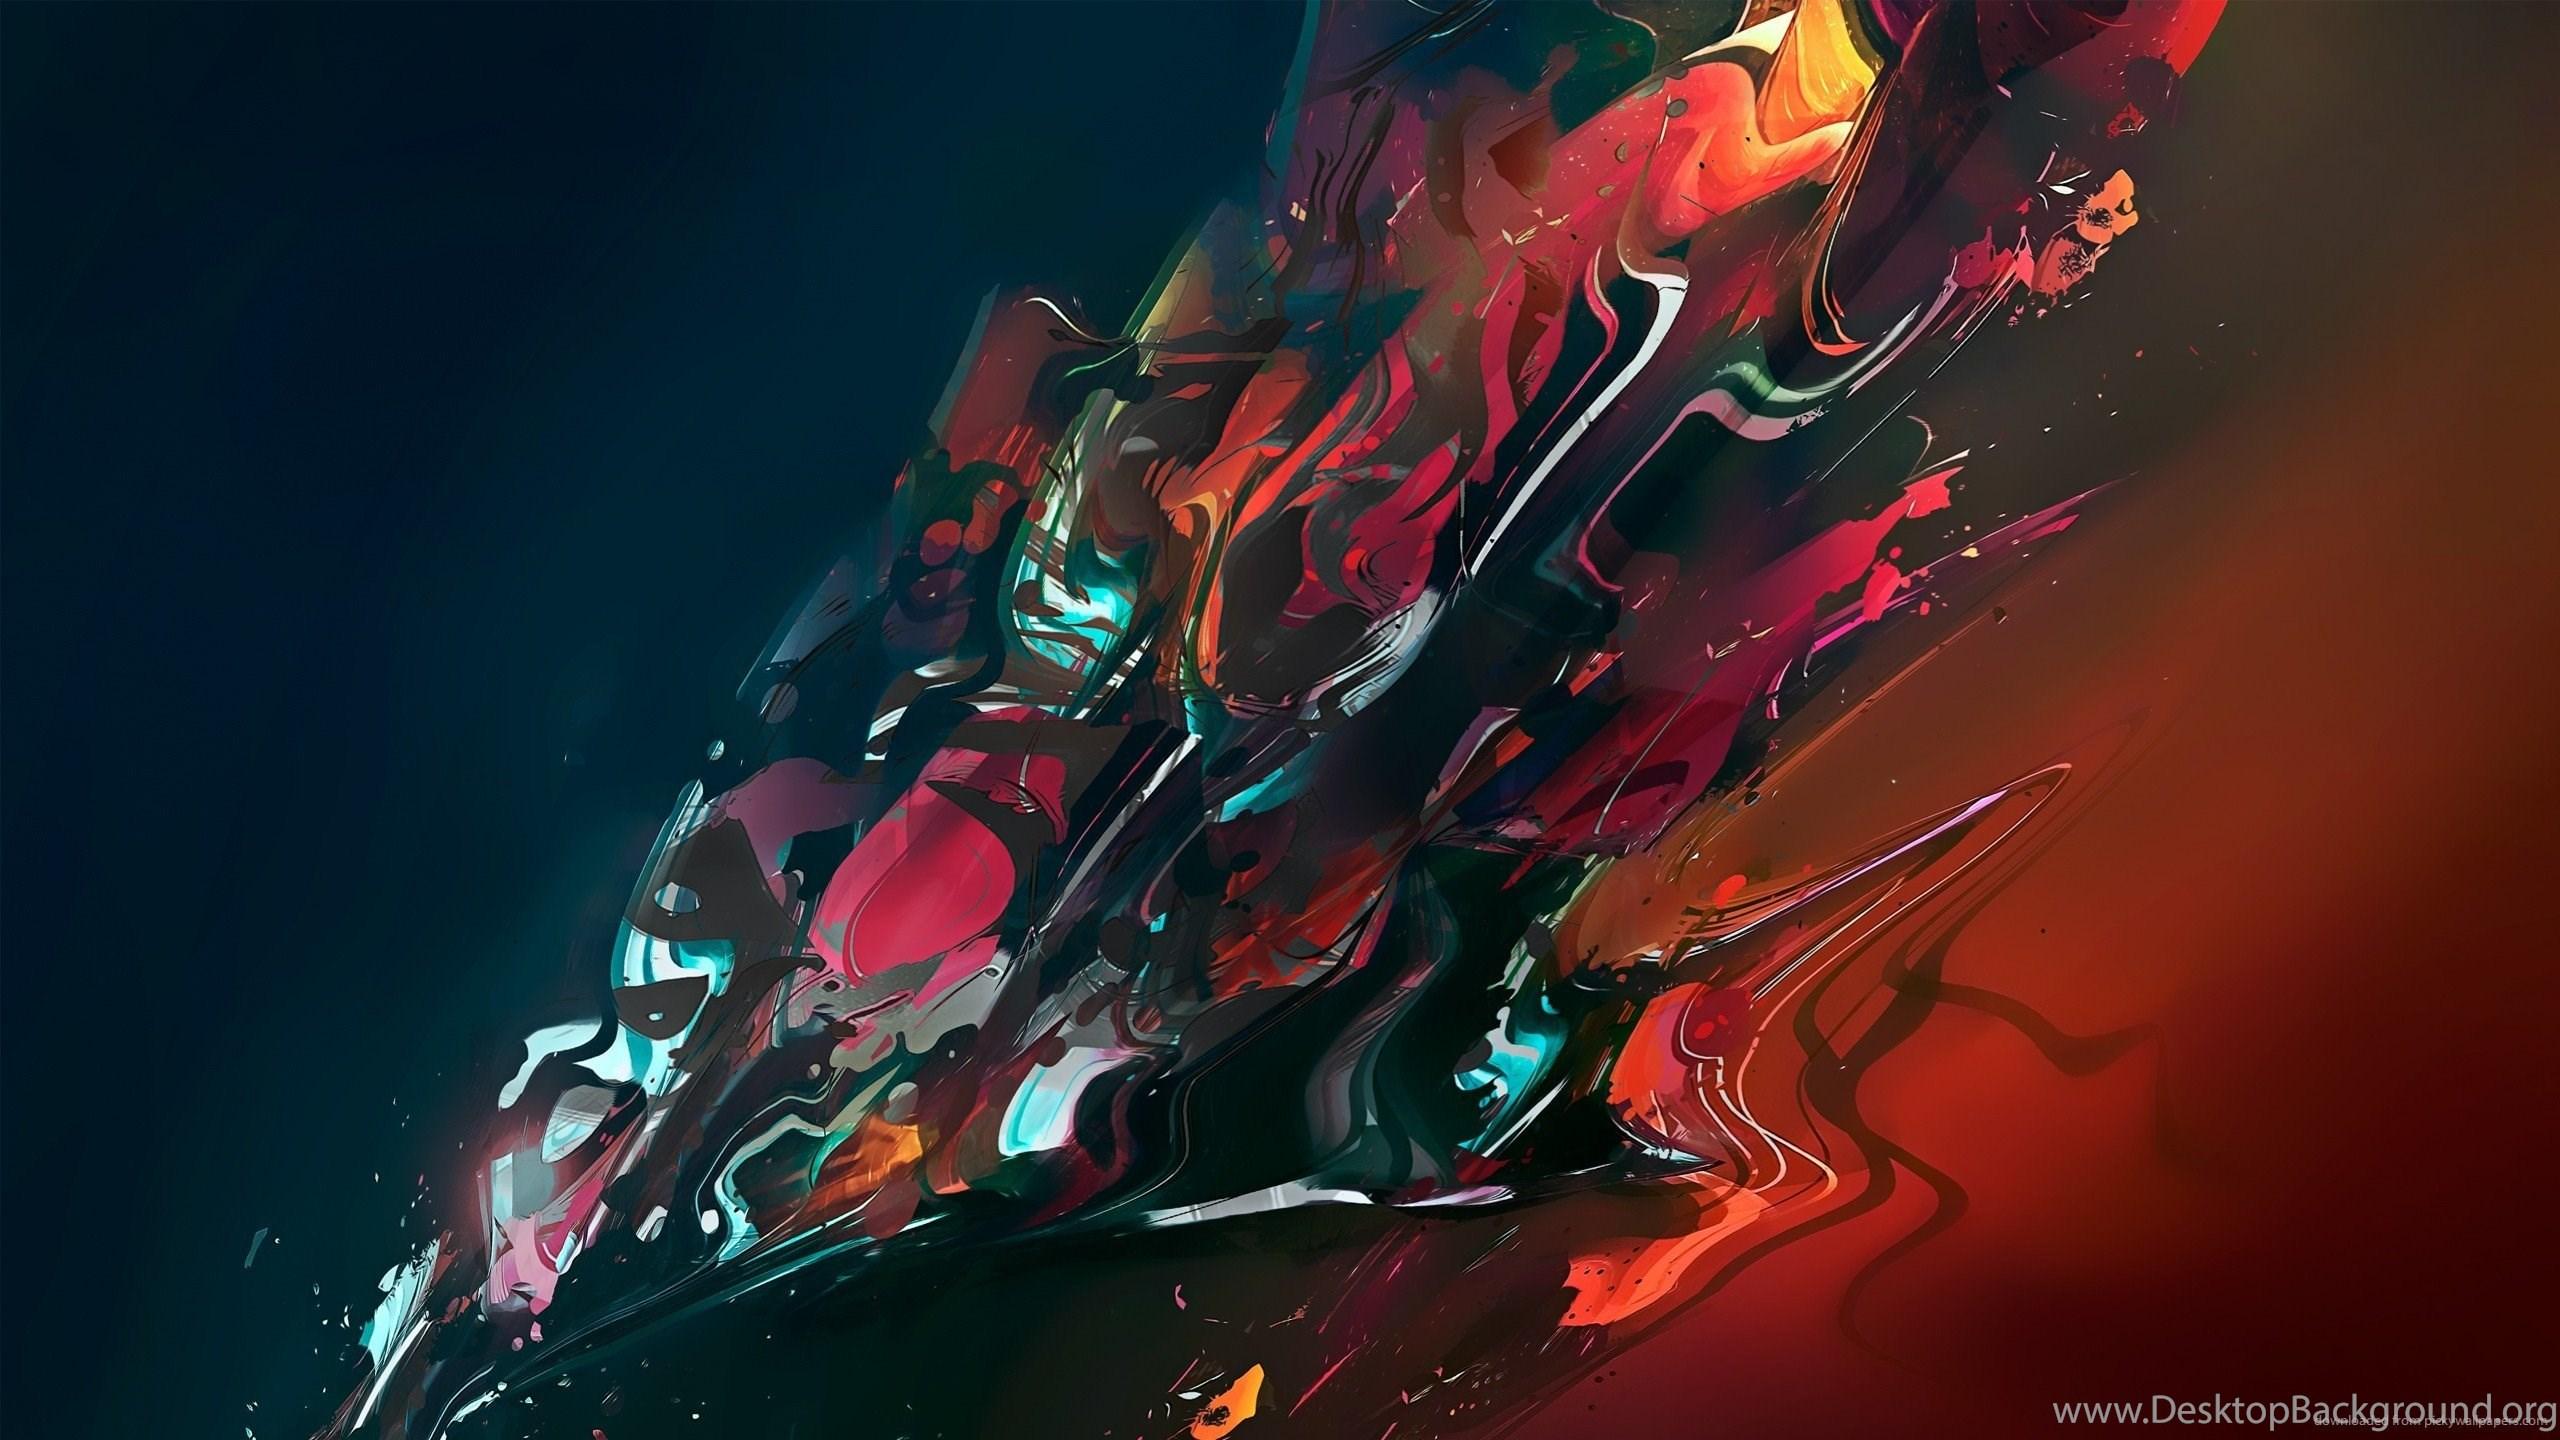 Download 2560x1440 Color Splash Wallpapers Desktop Background